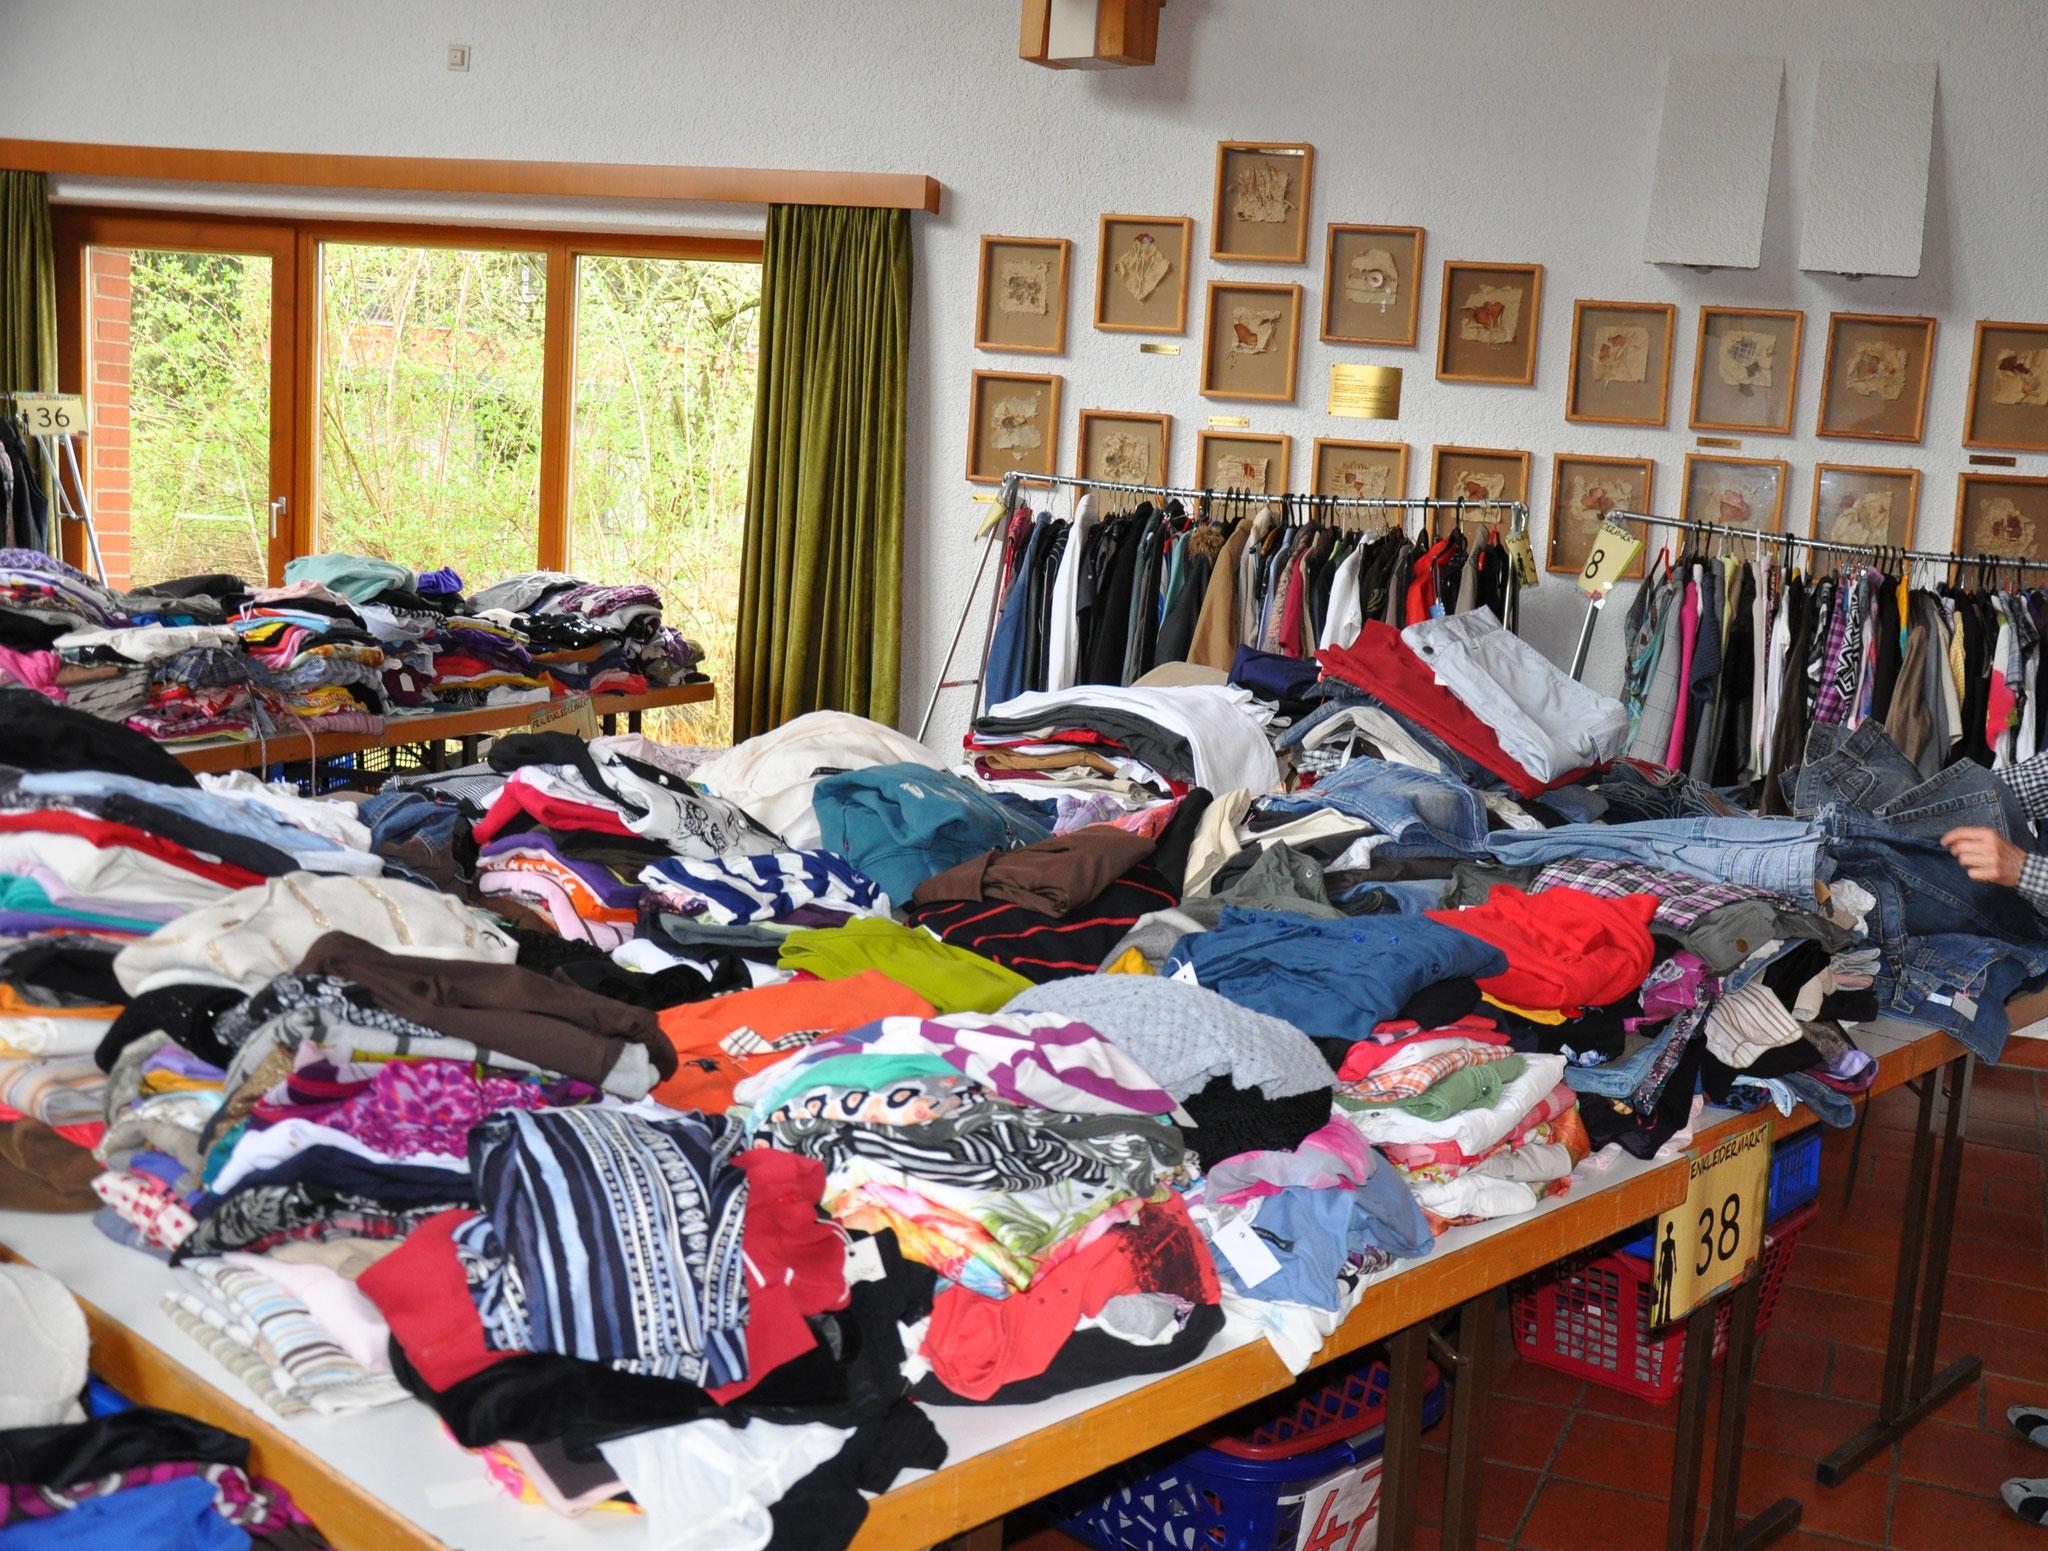 Frauenkleidermarkt